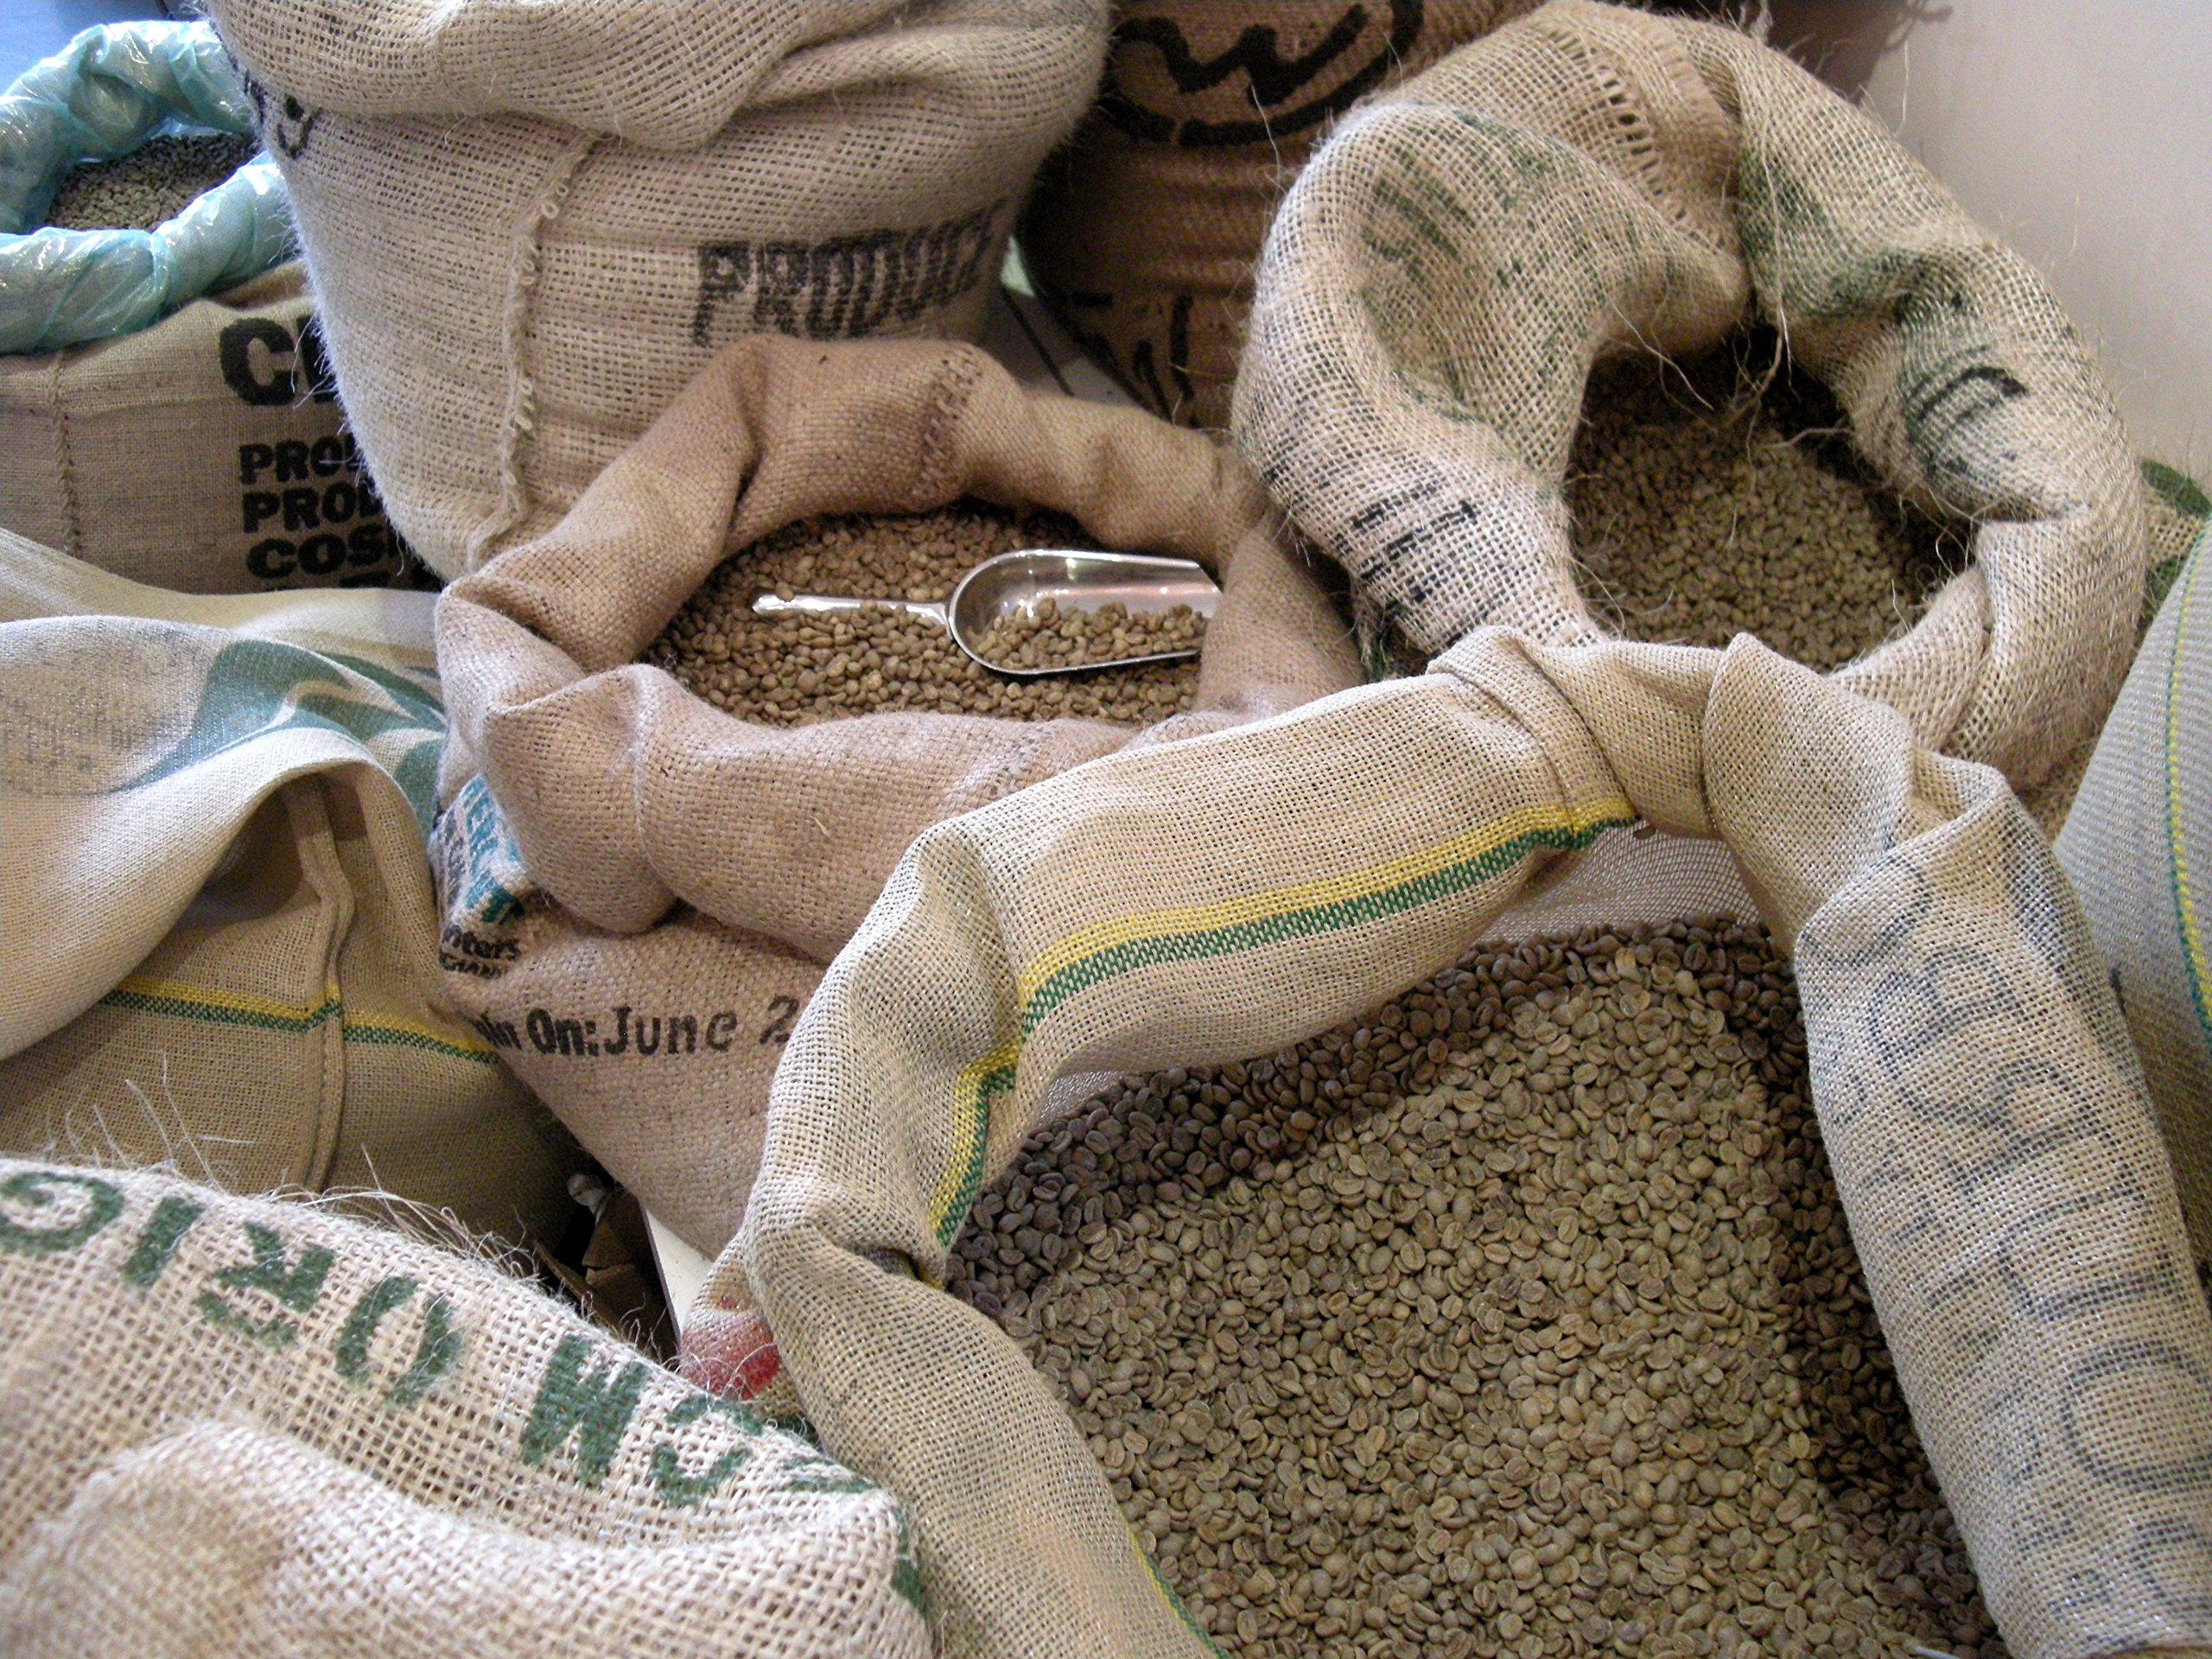 Green Unroasted 100% Arabica Coffee Beans, 5 Lb. Bag, RhoadsRoast Coffees (Rwanda Hingakawa Women's Co-op Fair Trade)